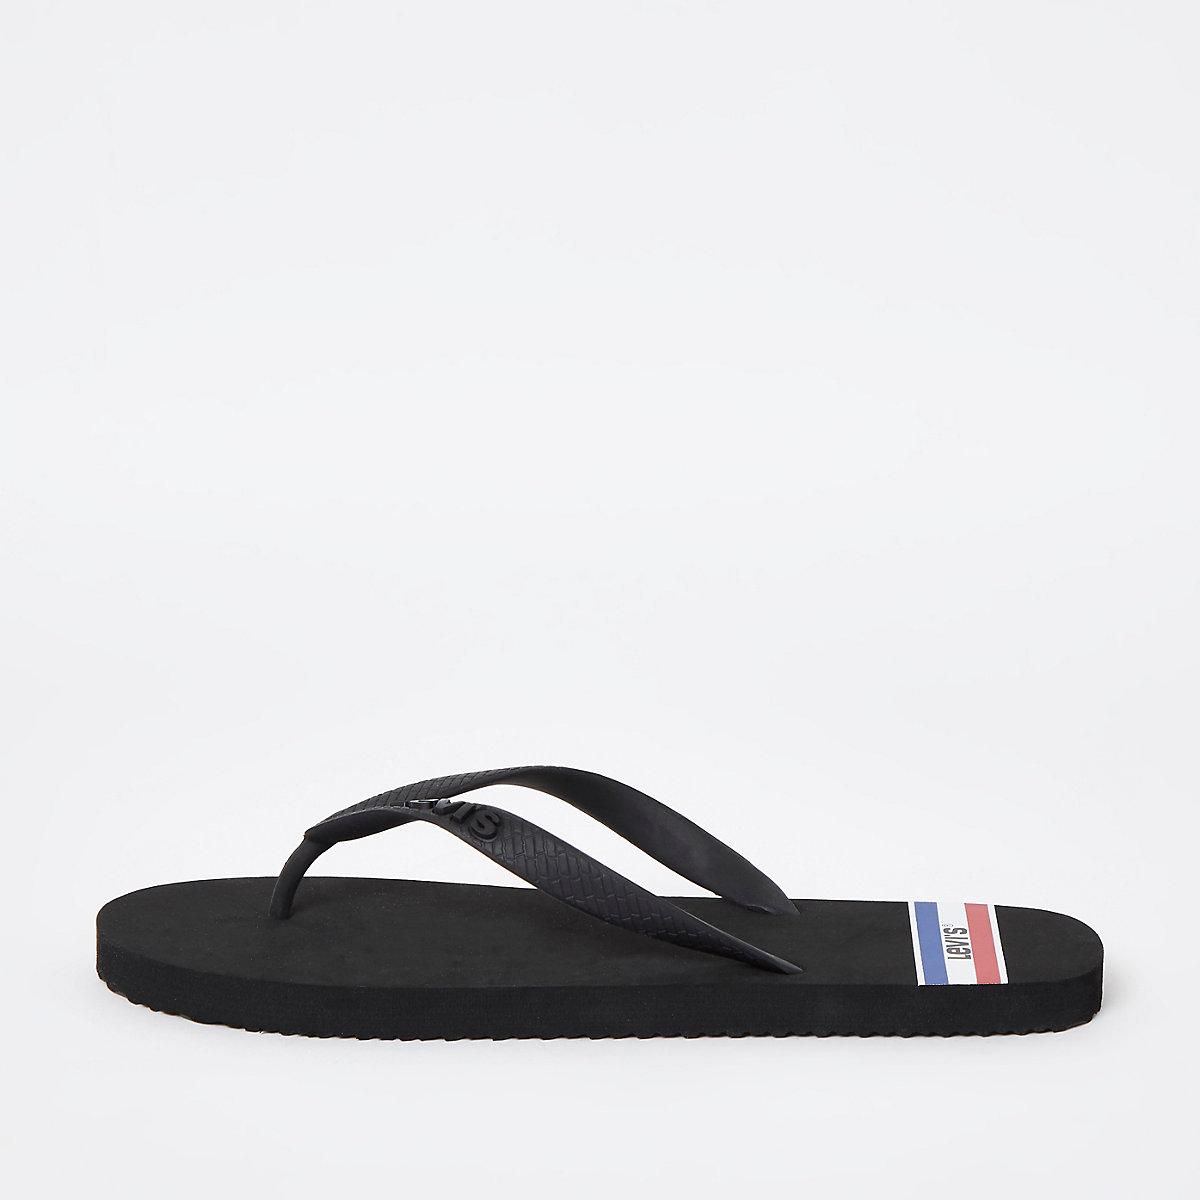 Levi's black sports flip flops